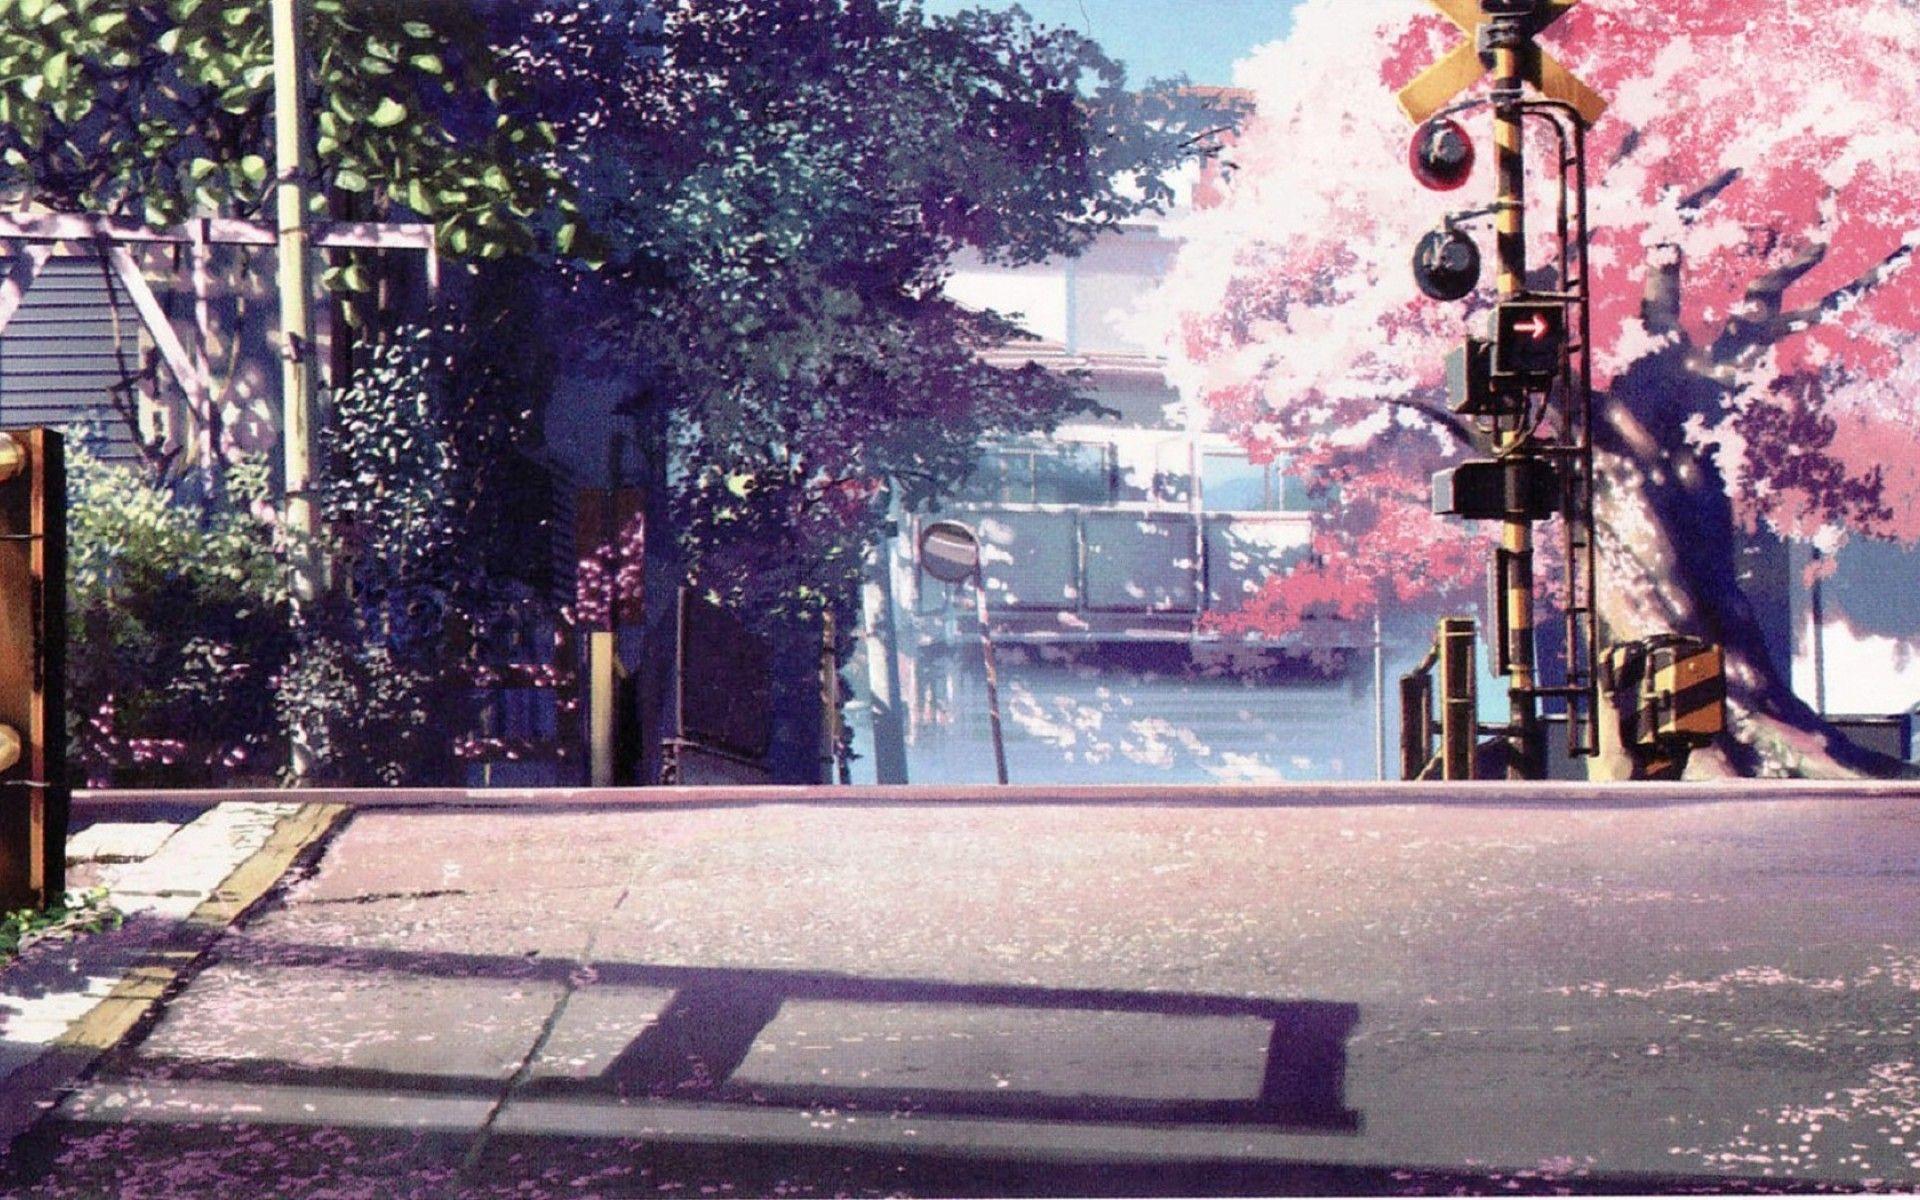 10 BingeWorthy Anime Anime scenery, Scenery and Anime